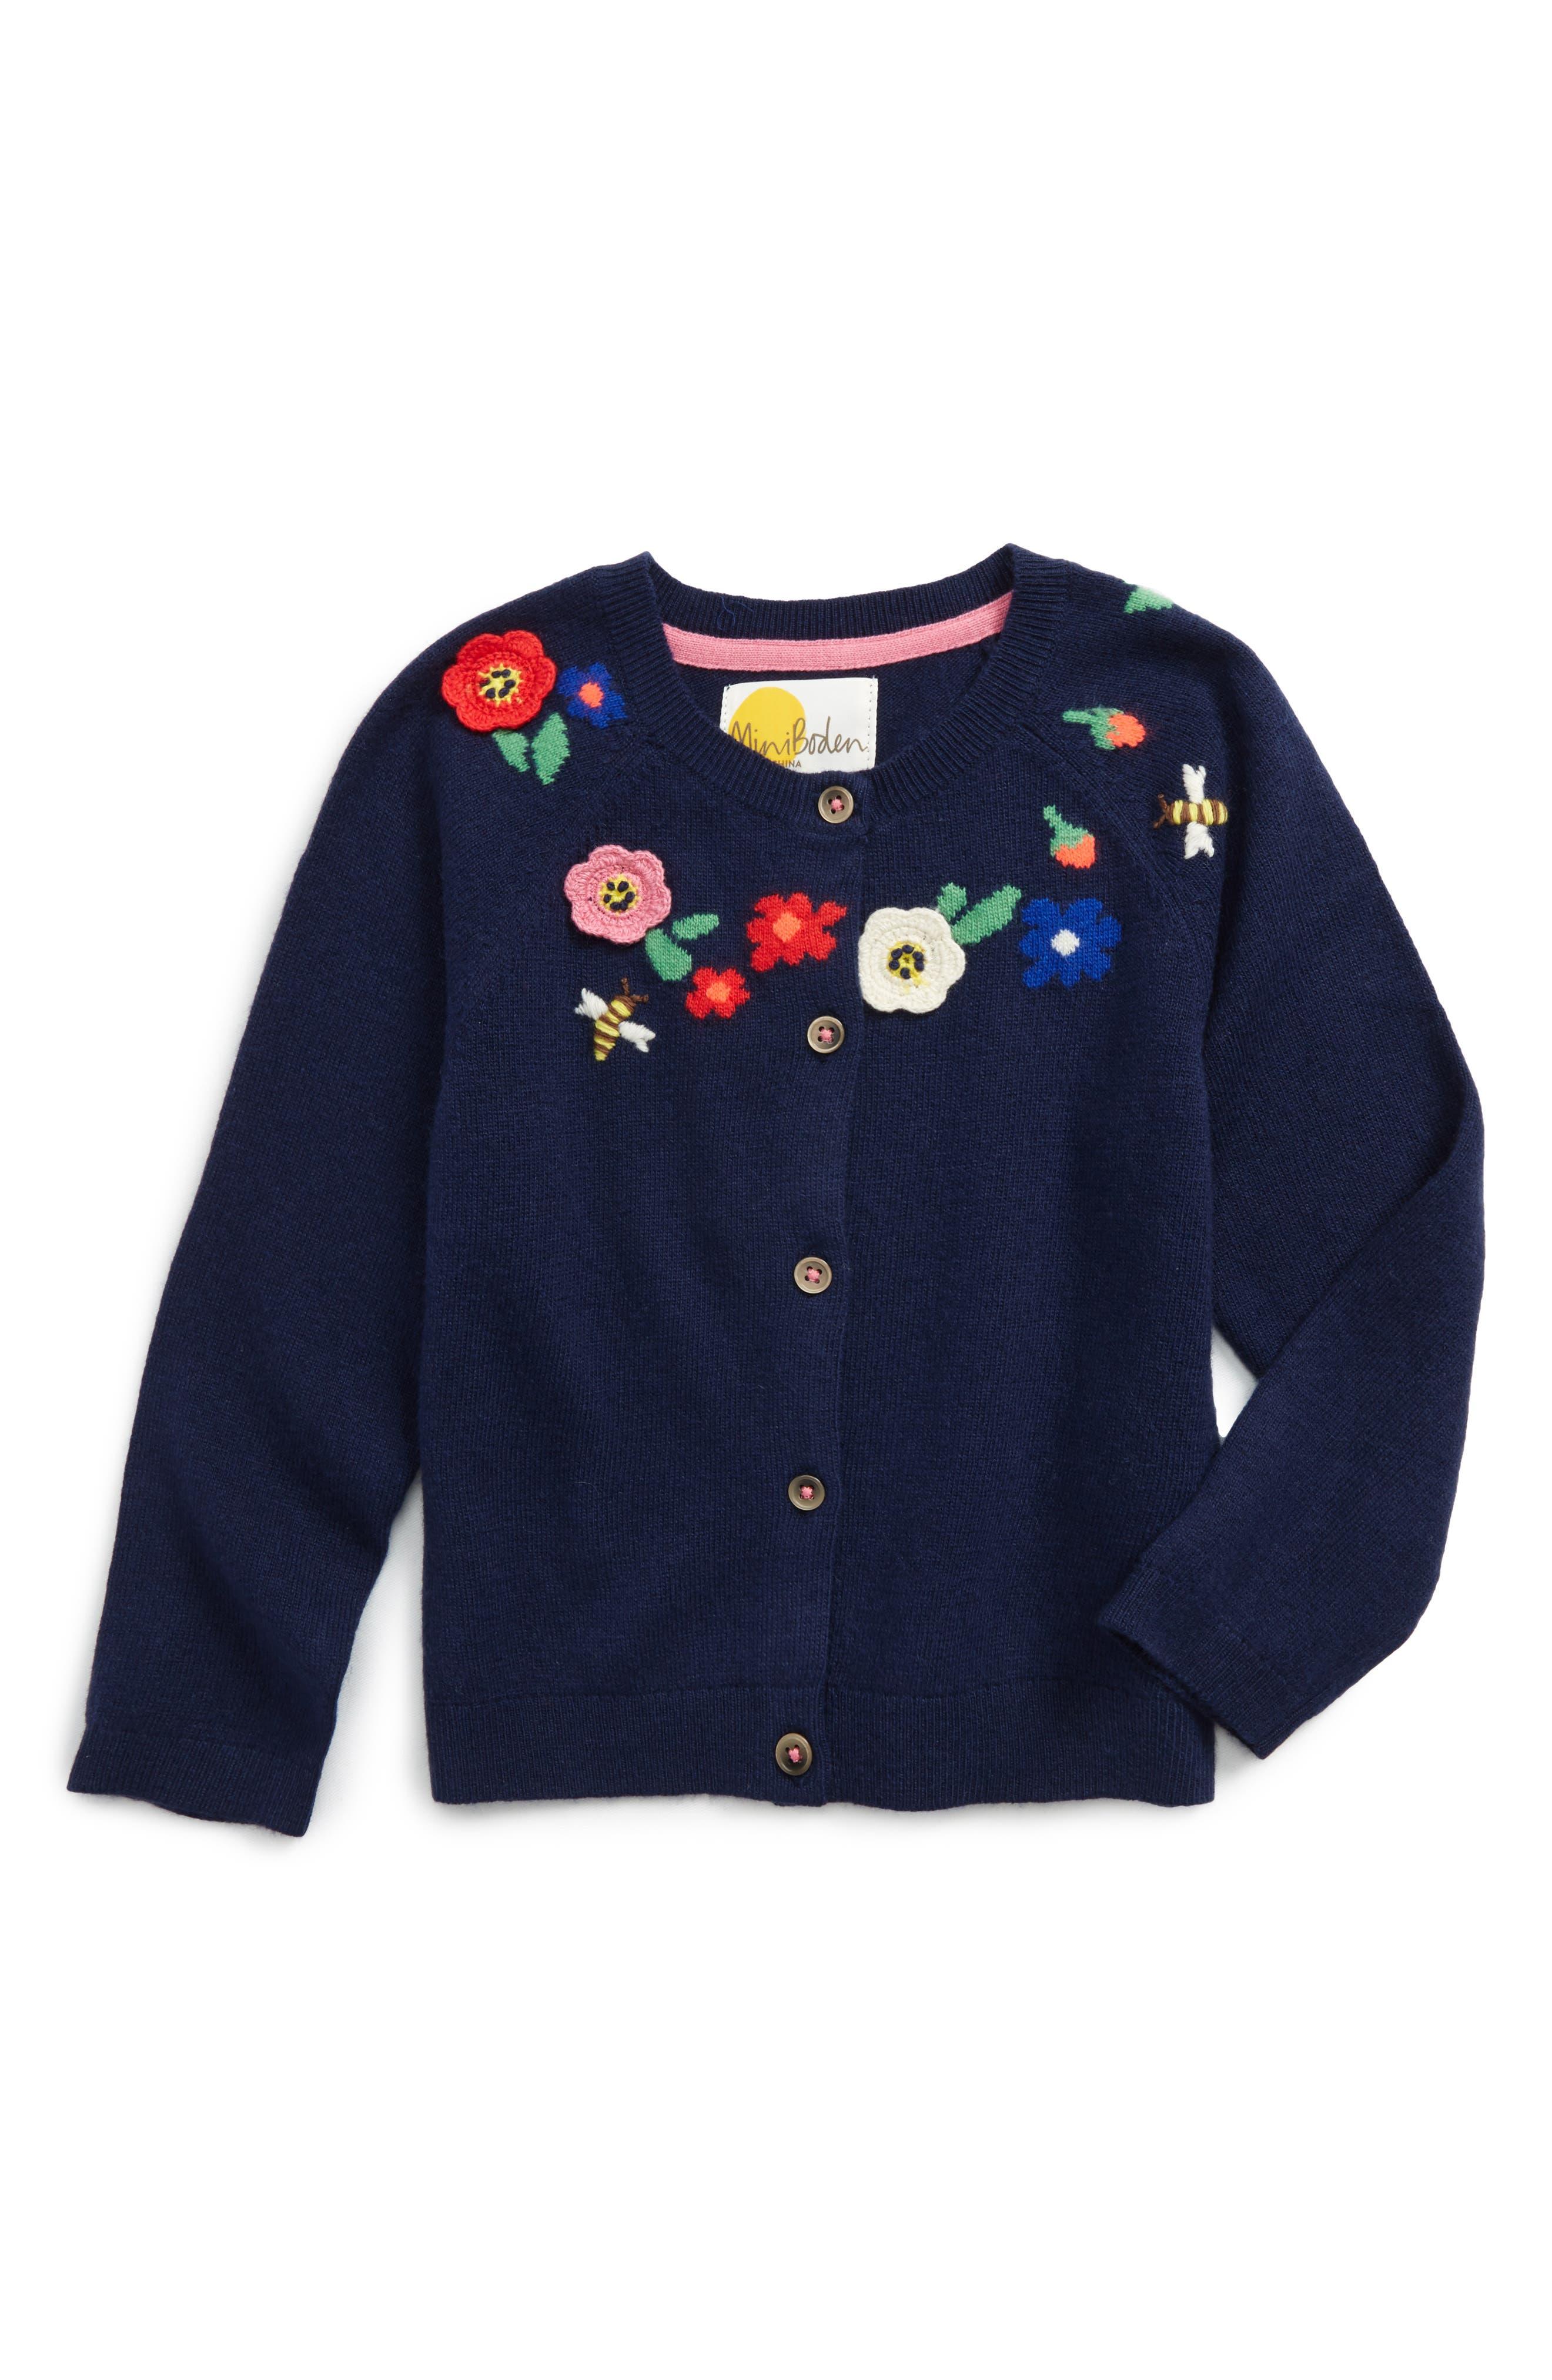 Alternate Image 1 Selected - Mini Boden Pretty Yoke Cardigan (Toddler Girls, Little Girls & Big Girls)